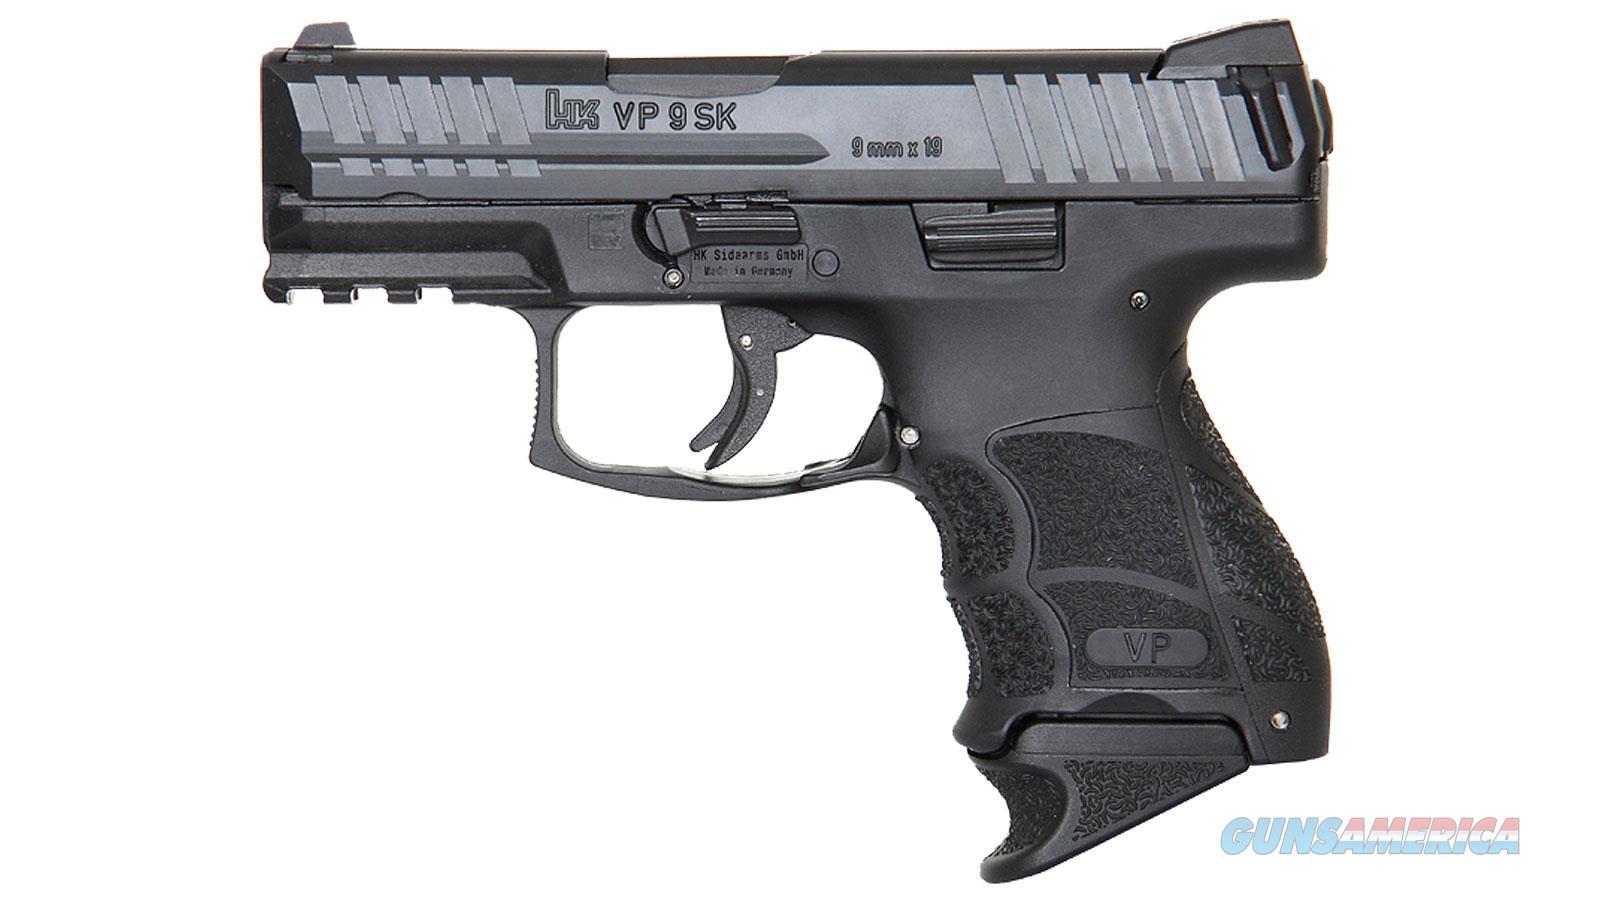 "Heckler & Koch Vp9sk Striker Fired 9Mm 3.39"" Bbl 3-Dot Ns 3-10Rd Blk 700009KLE-A5  Guns > Pistols > H Misc Pistols"